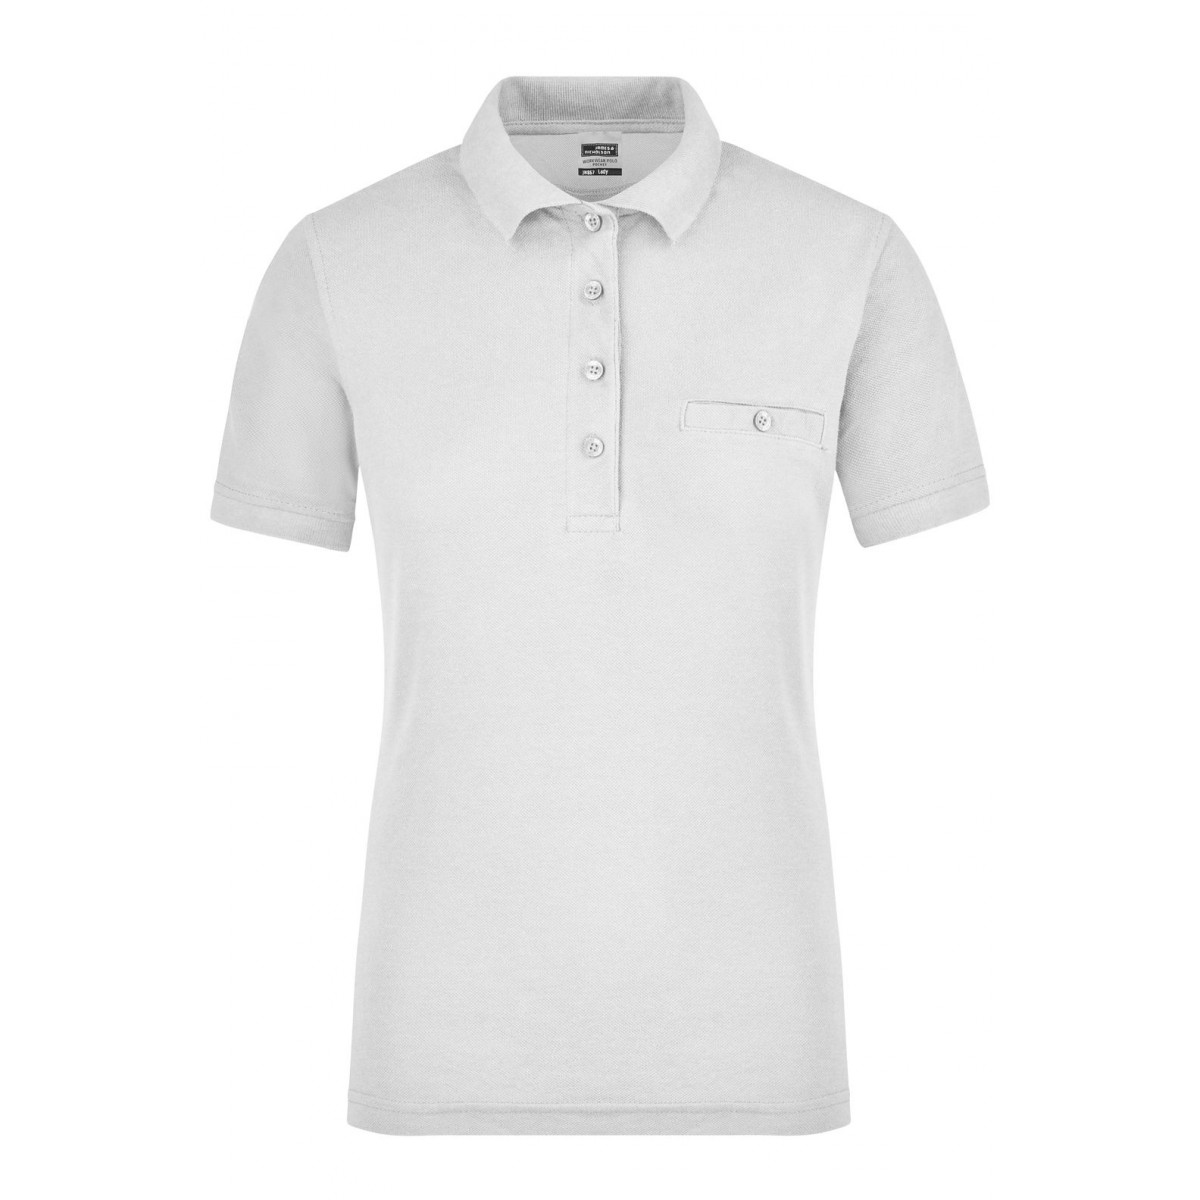 Рубашка поло женская JN867 Ladies Workwear Polo Pocket - Белый